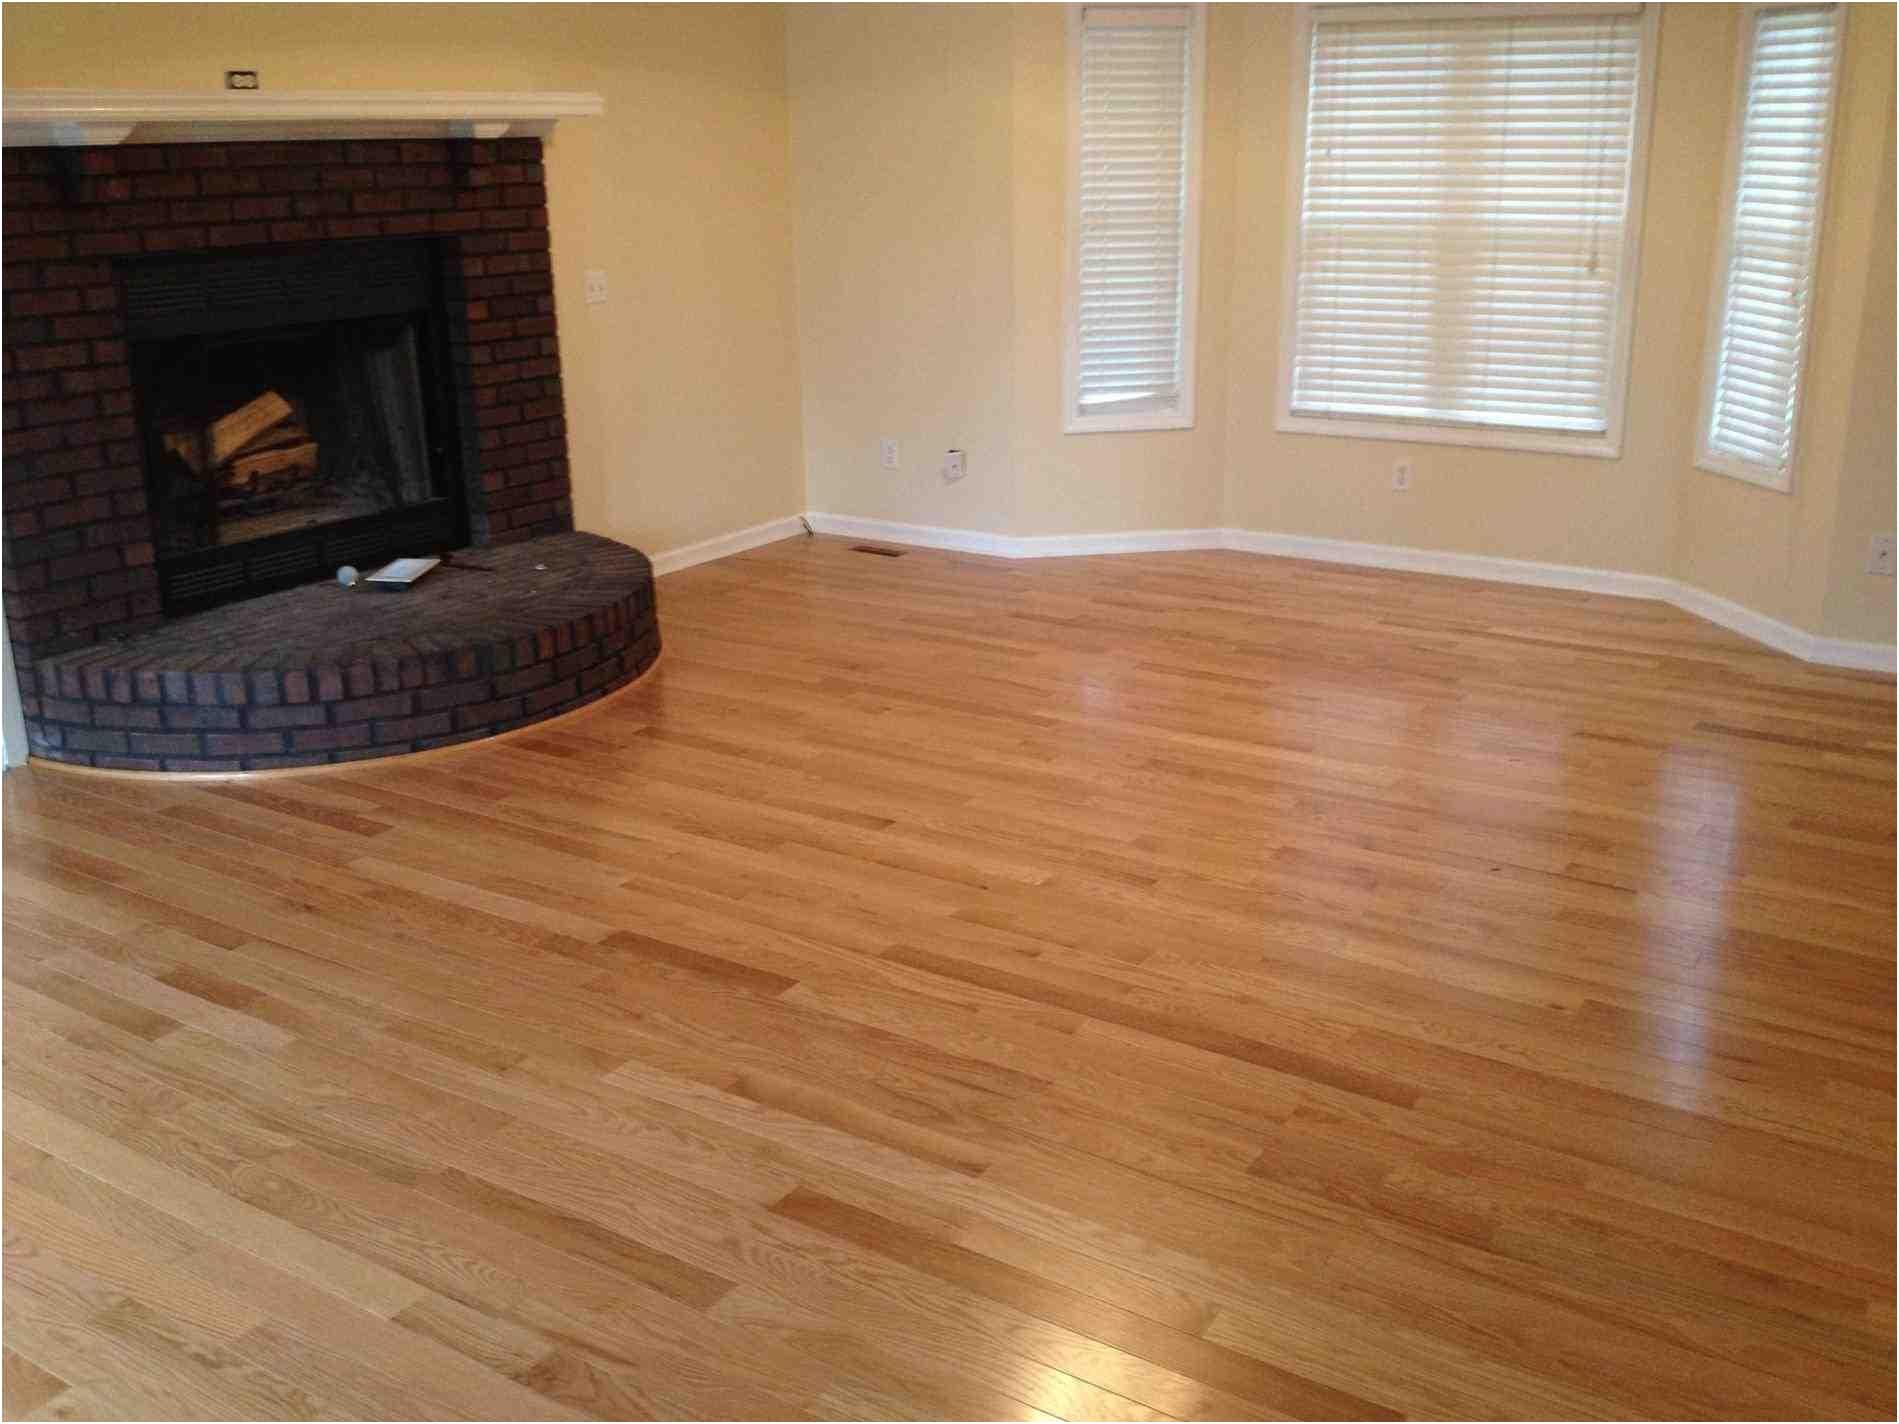 bd hardwood floors of wood laminate flooring vs hardwood lovely engineered hardwood with related post